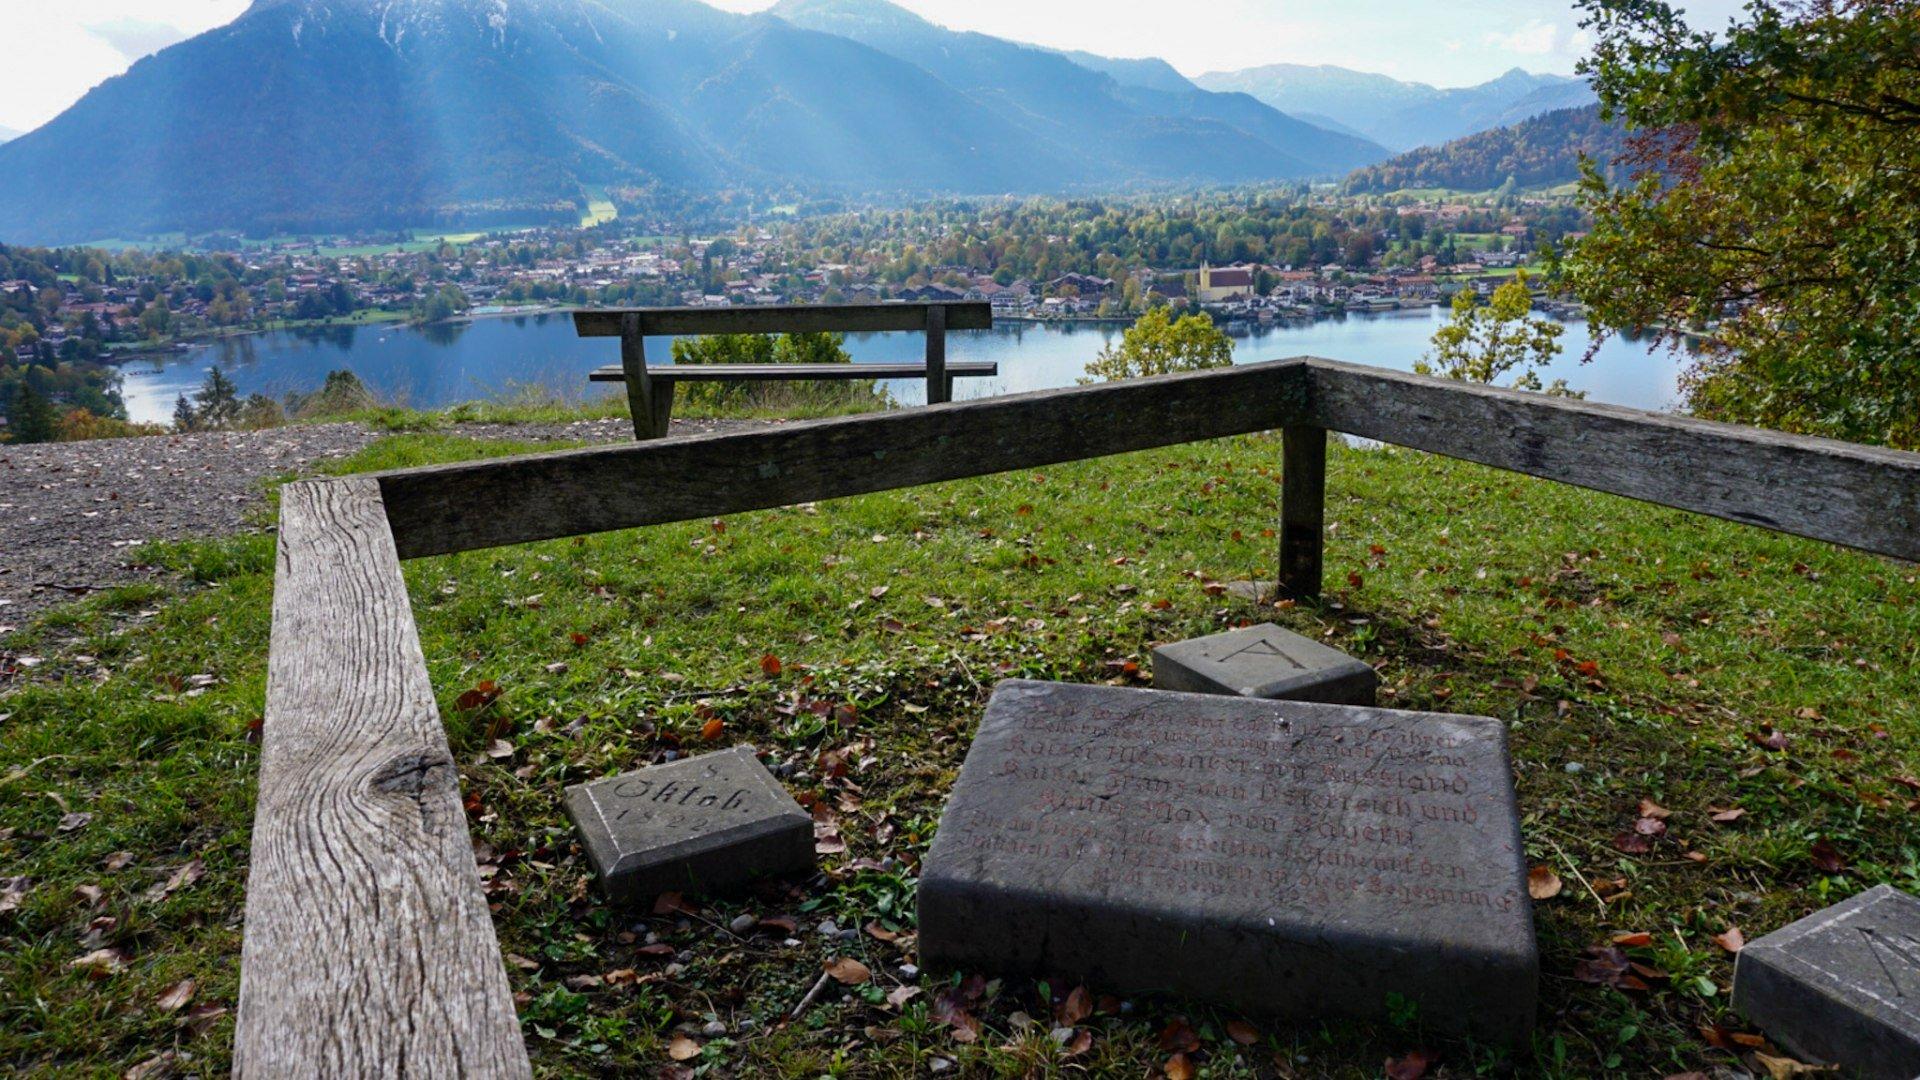 Gedenktafel, © Der Tegernsee, Hannah Bachmeier